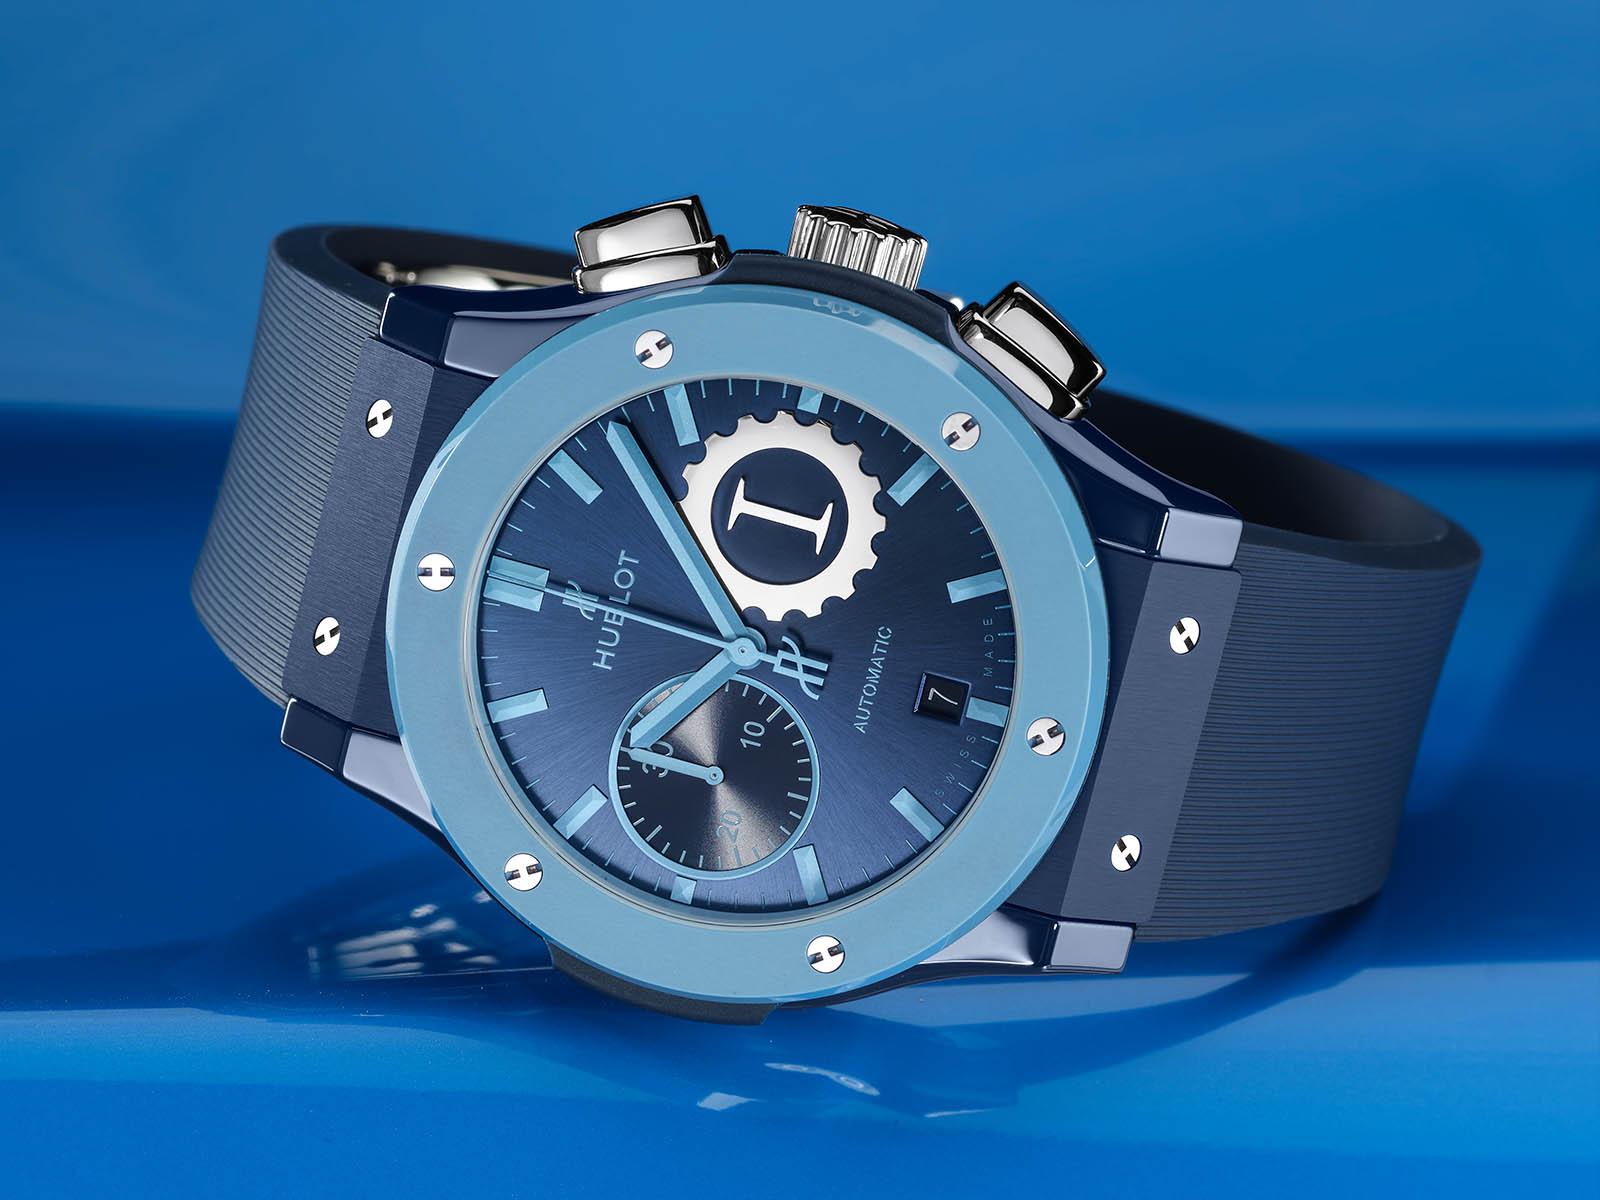 hublot-classic-fusion-chronograph-garage-italia-521-ex-7170-rx-git19-4.jpg